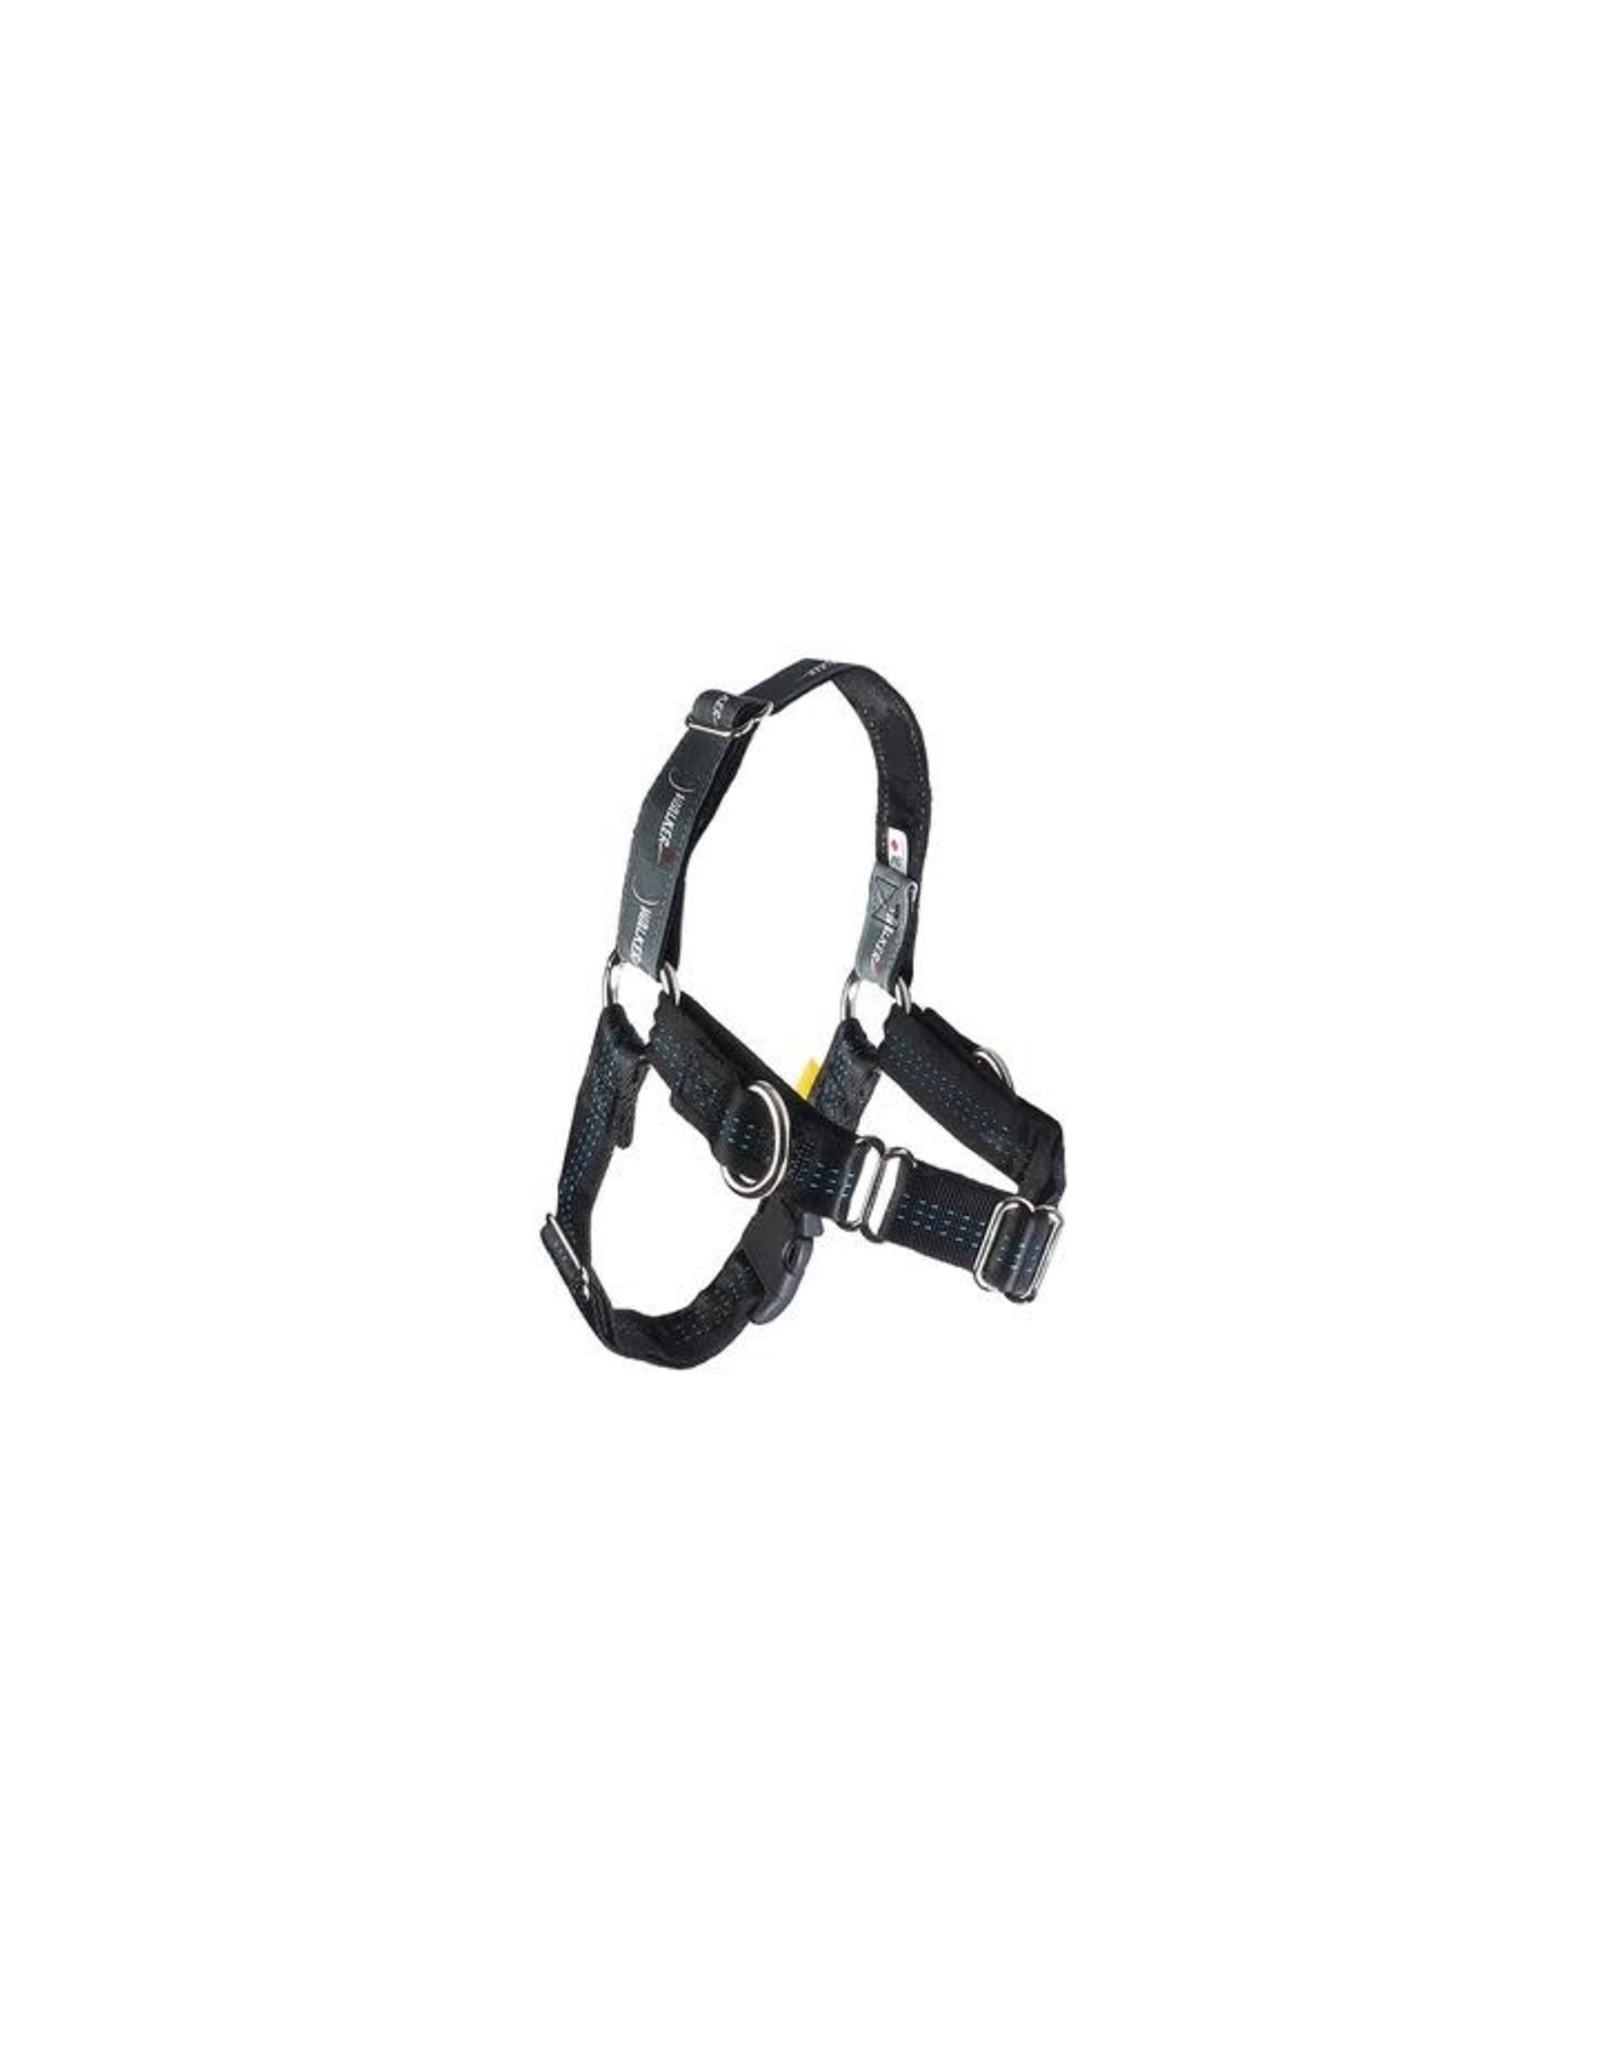 JWalker JWalker Harness - Black - M/L